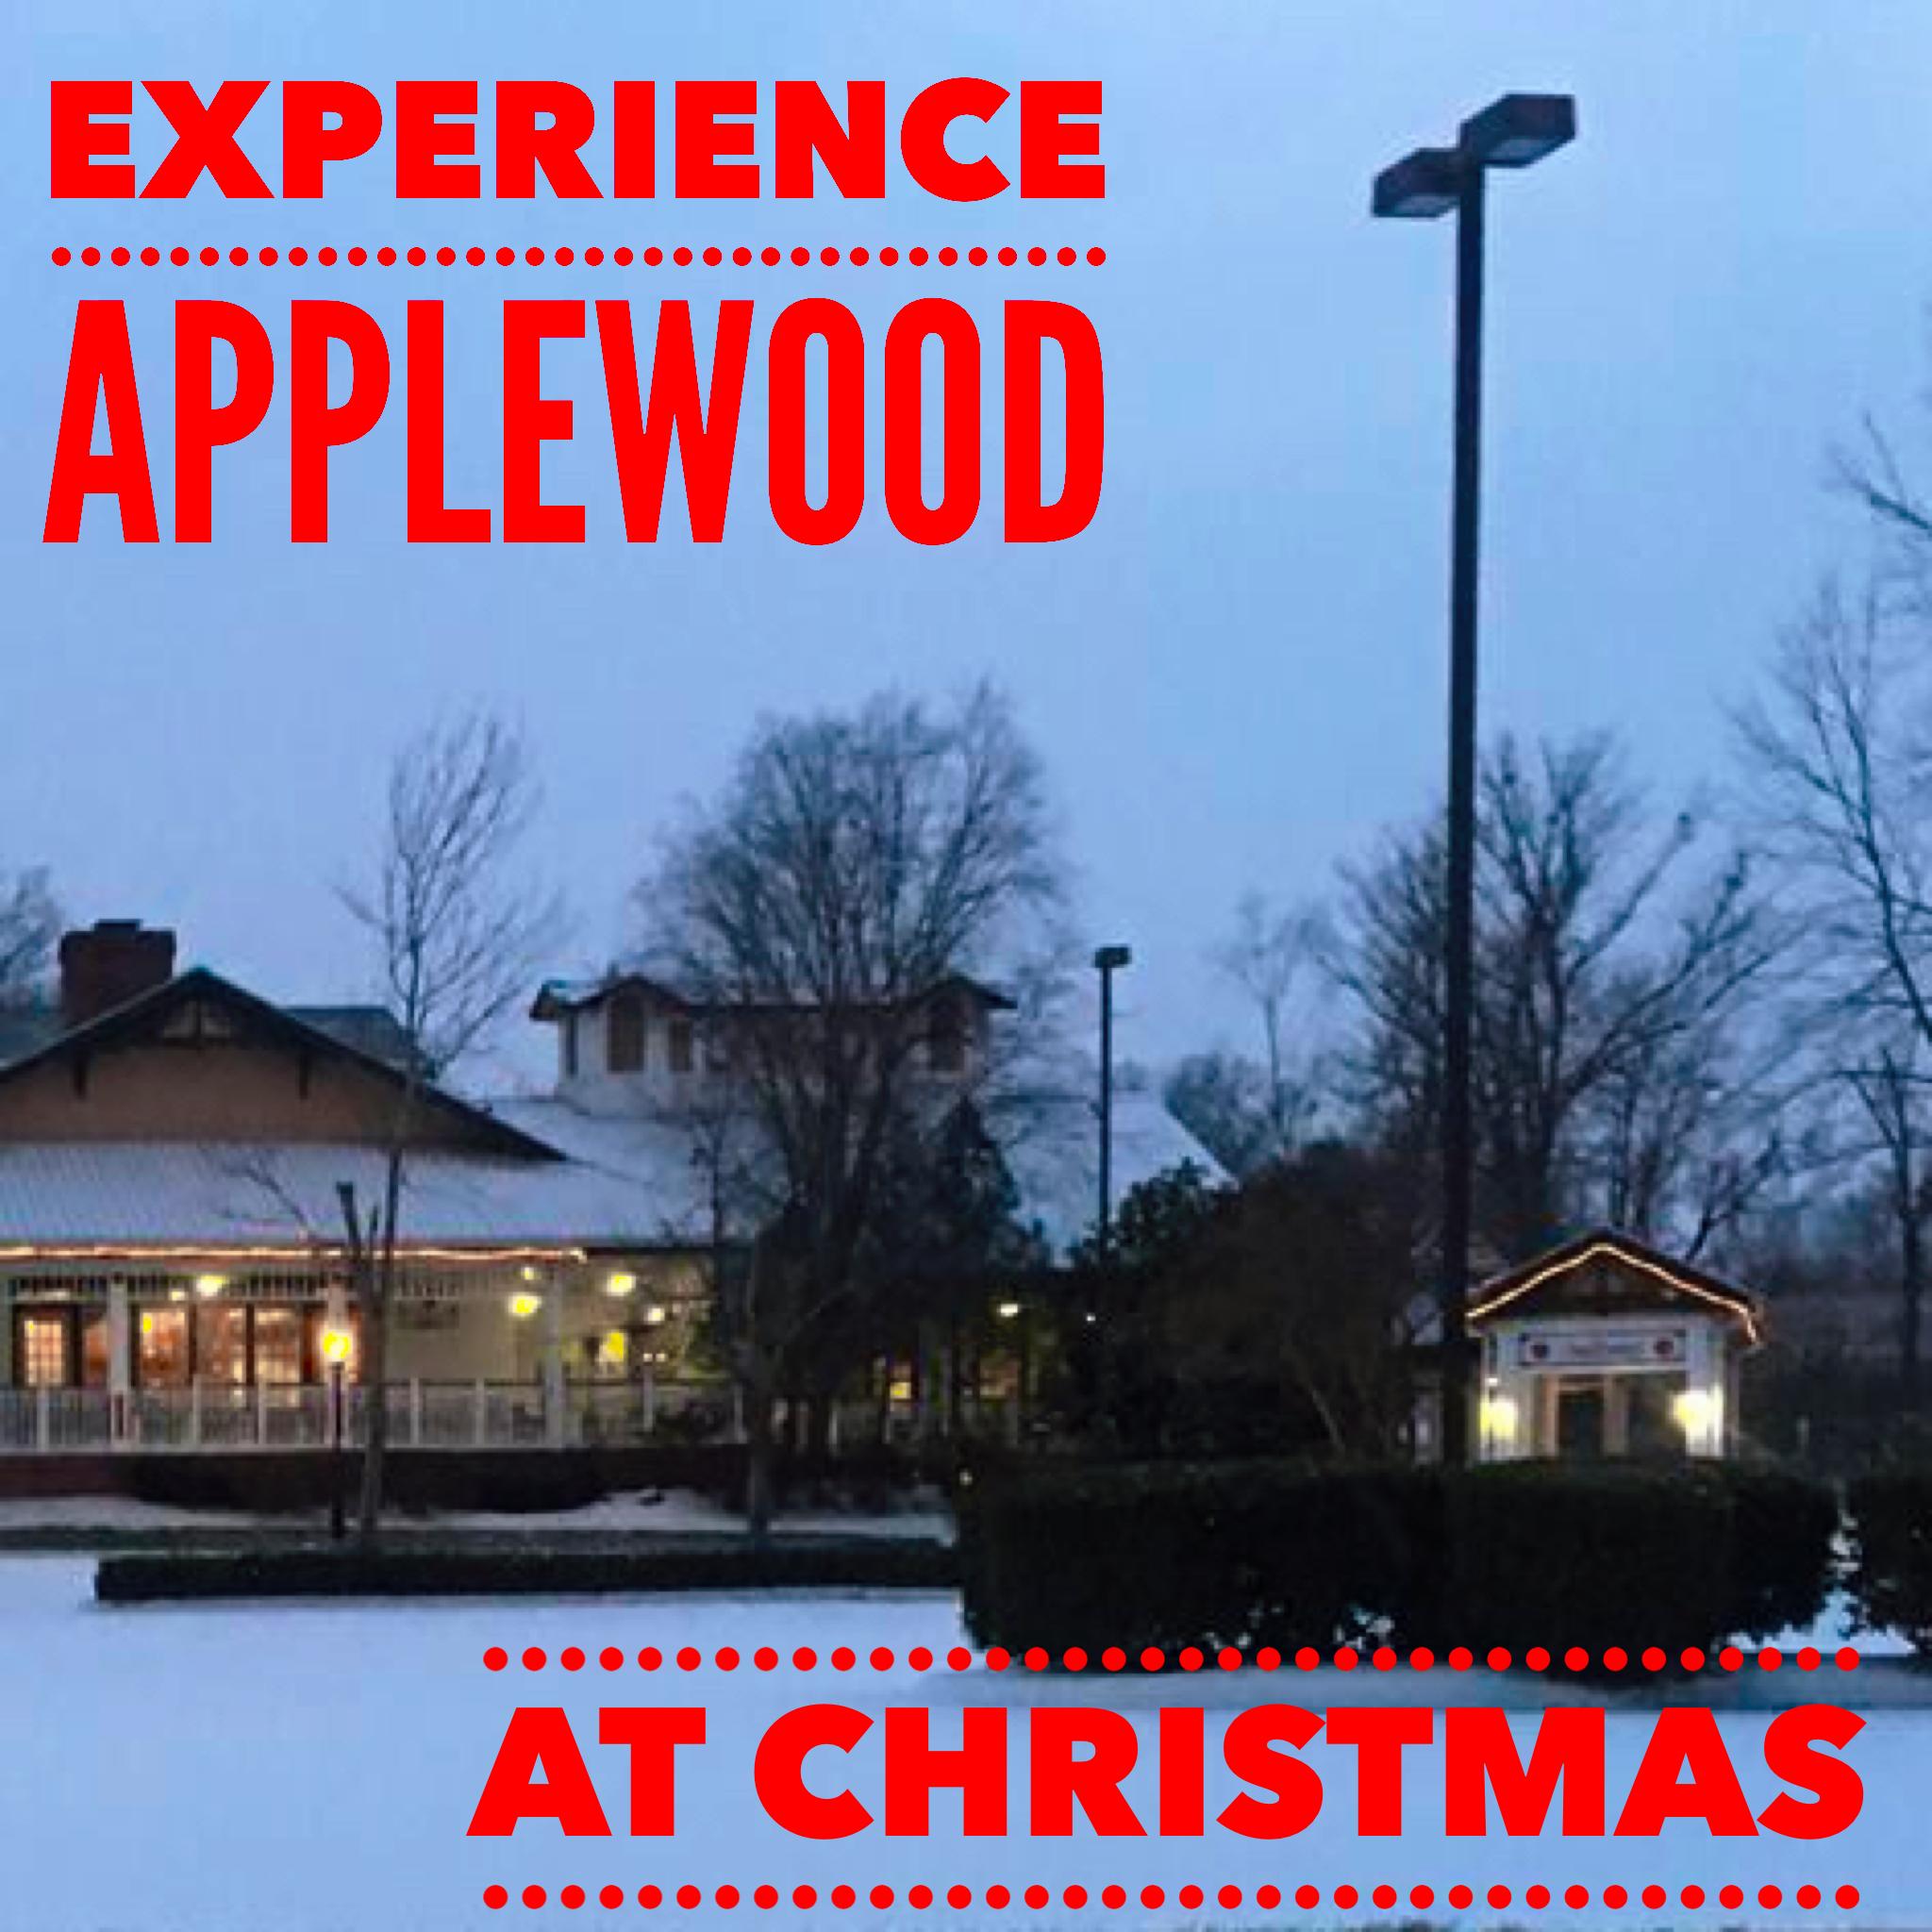 The Christmas season at Applewood Farmhouse Restaurant is